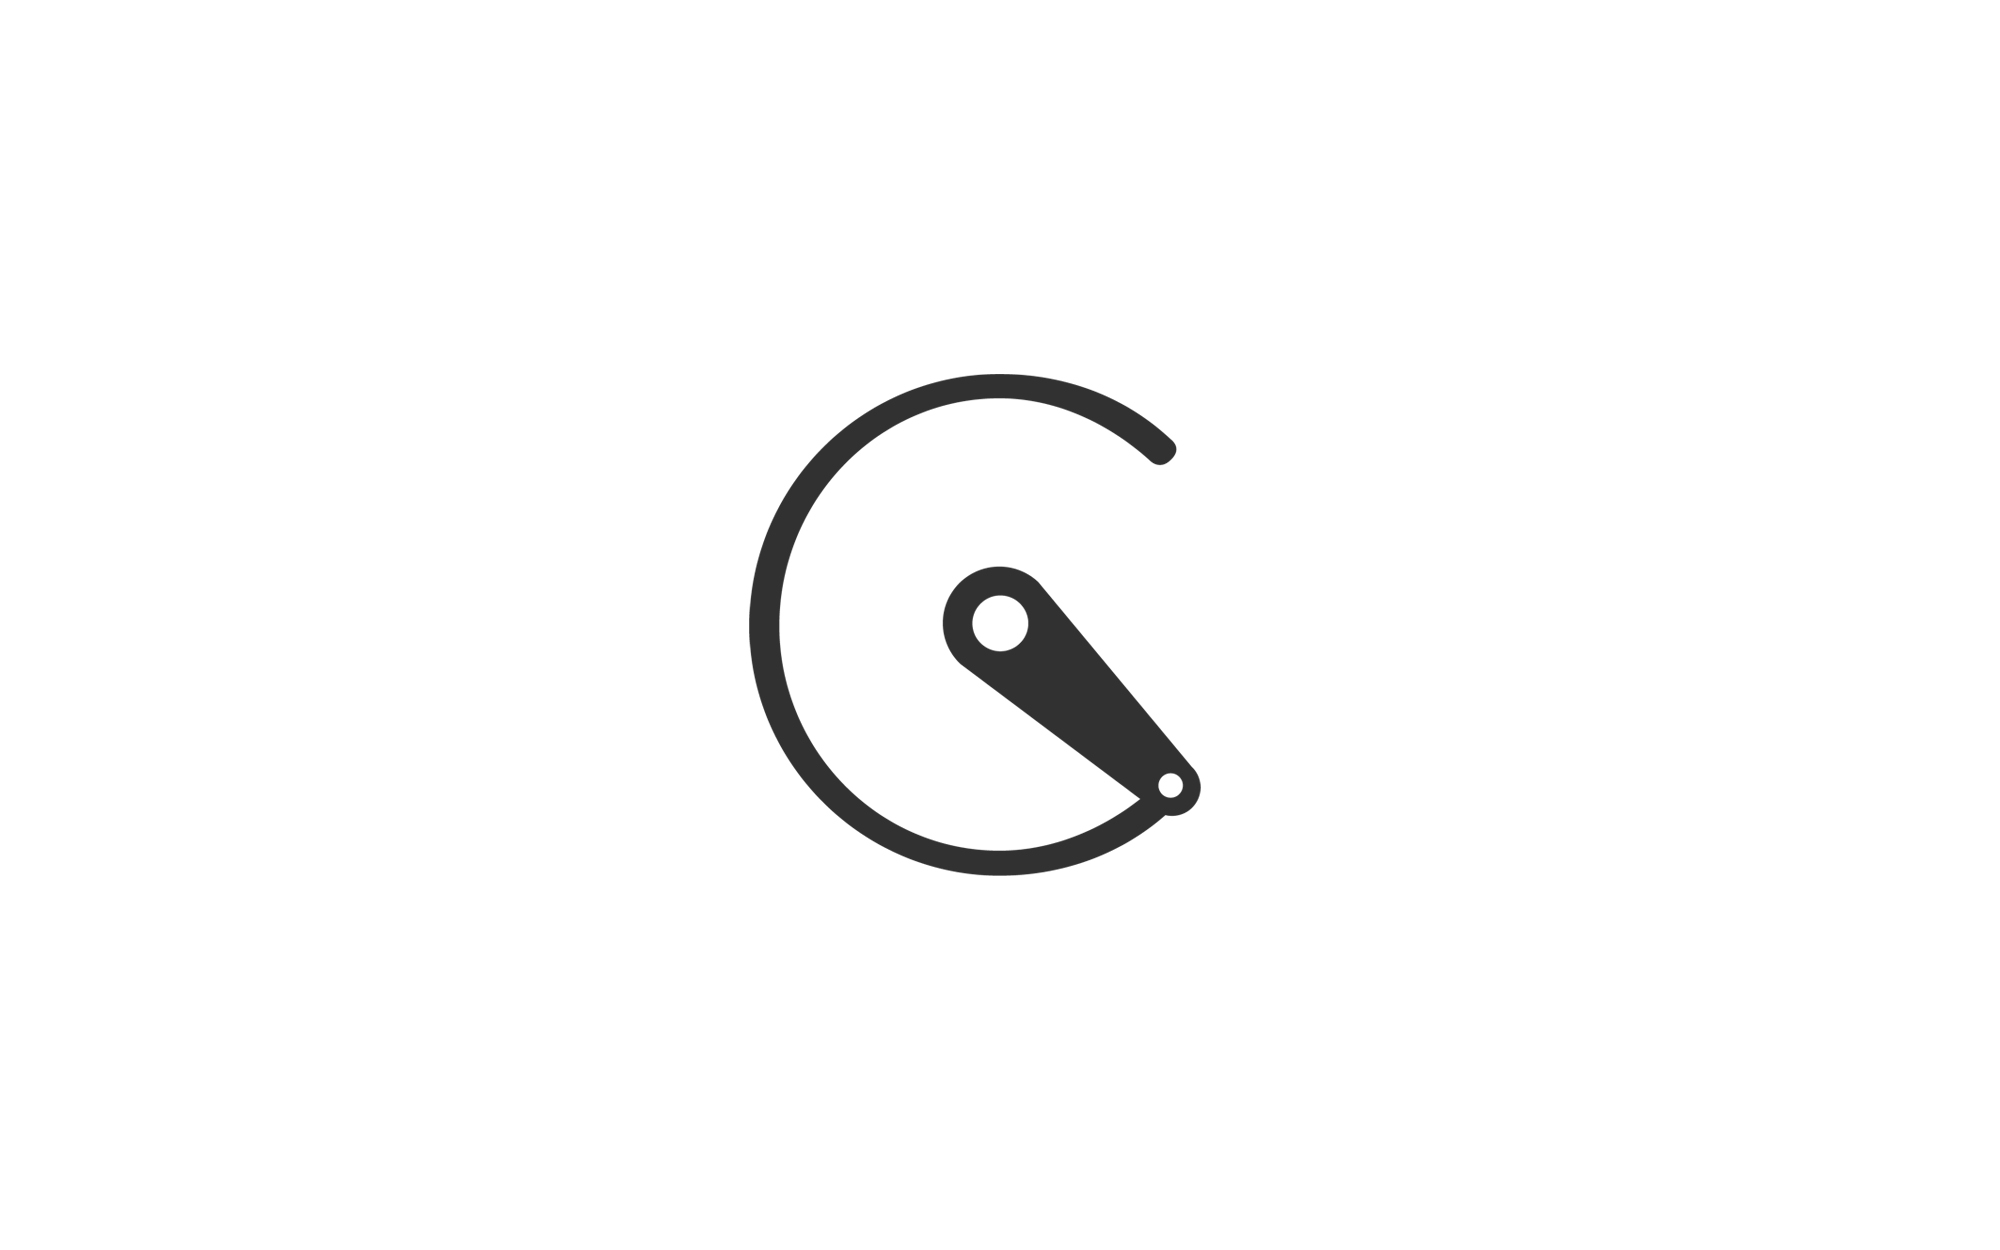 crank_logo_design_branding_matthew_pomorski_kent_graphic_design